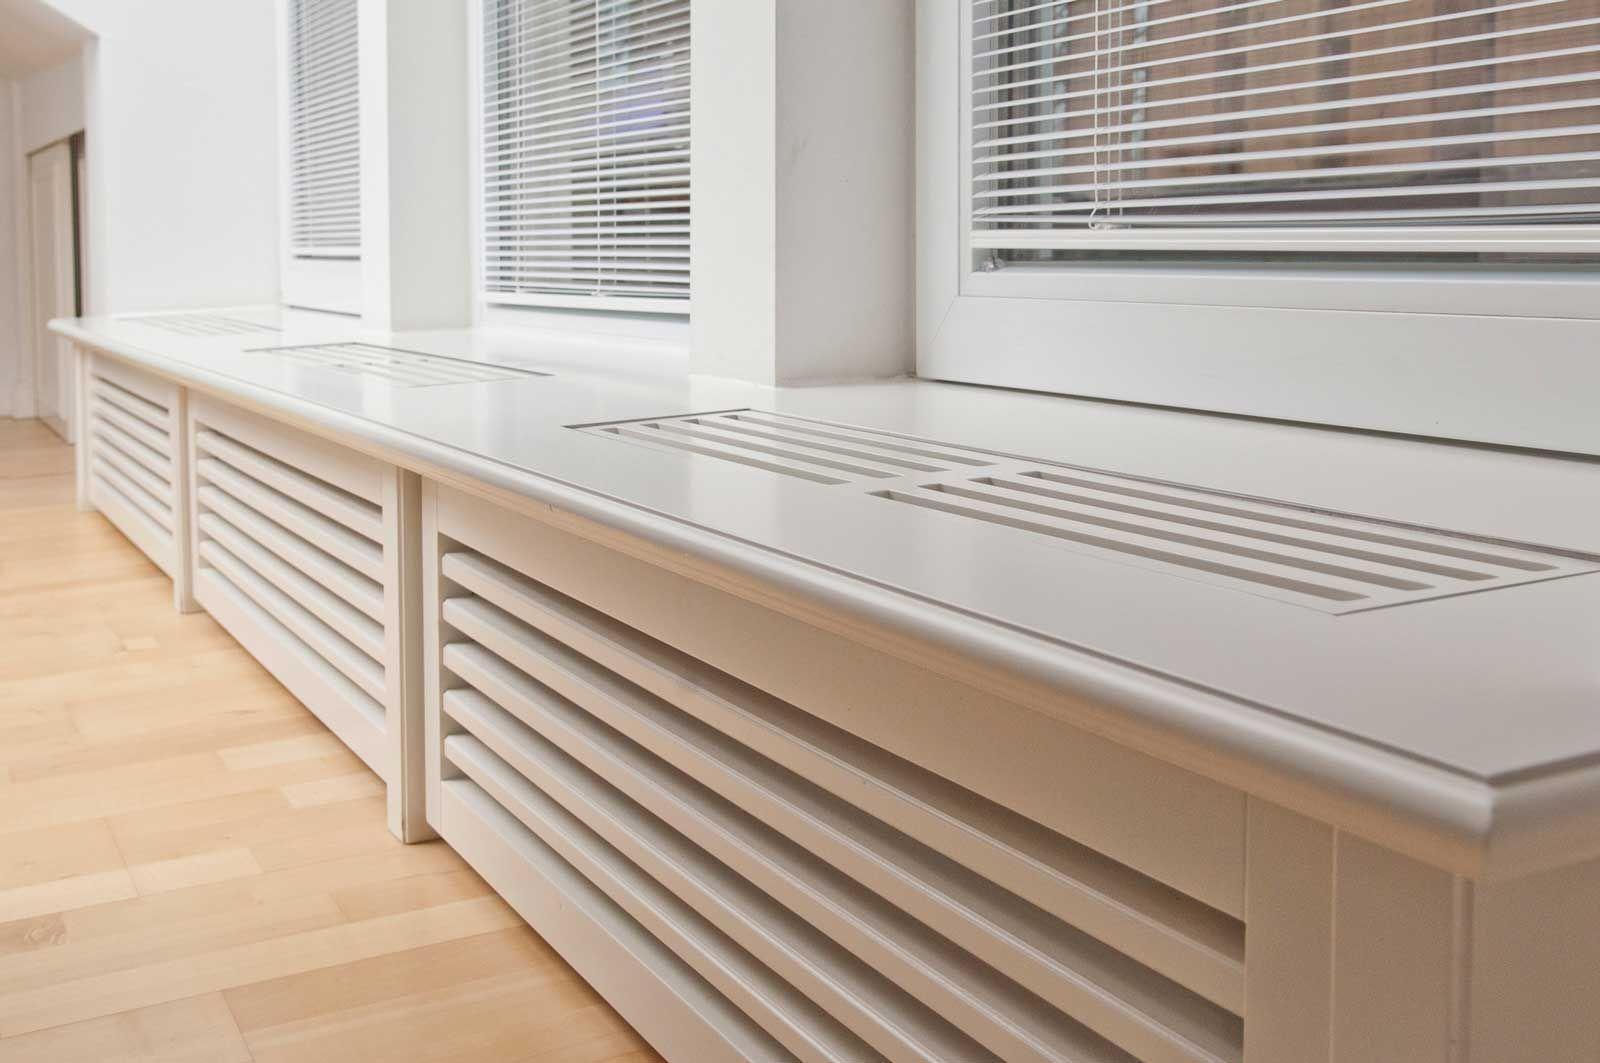 heizk rperverkleidung google suche heizk rperverkleidungen pinterest. Black Bedroom Furniture Sets. Home Design Ideas